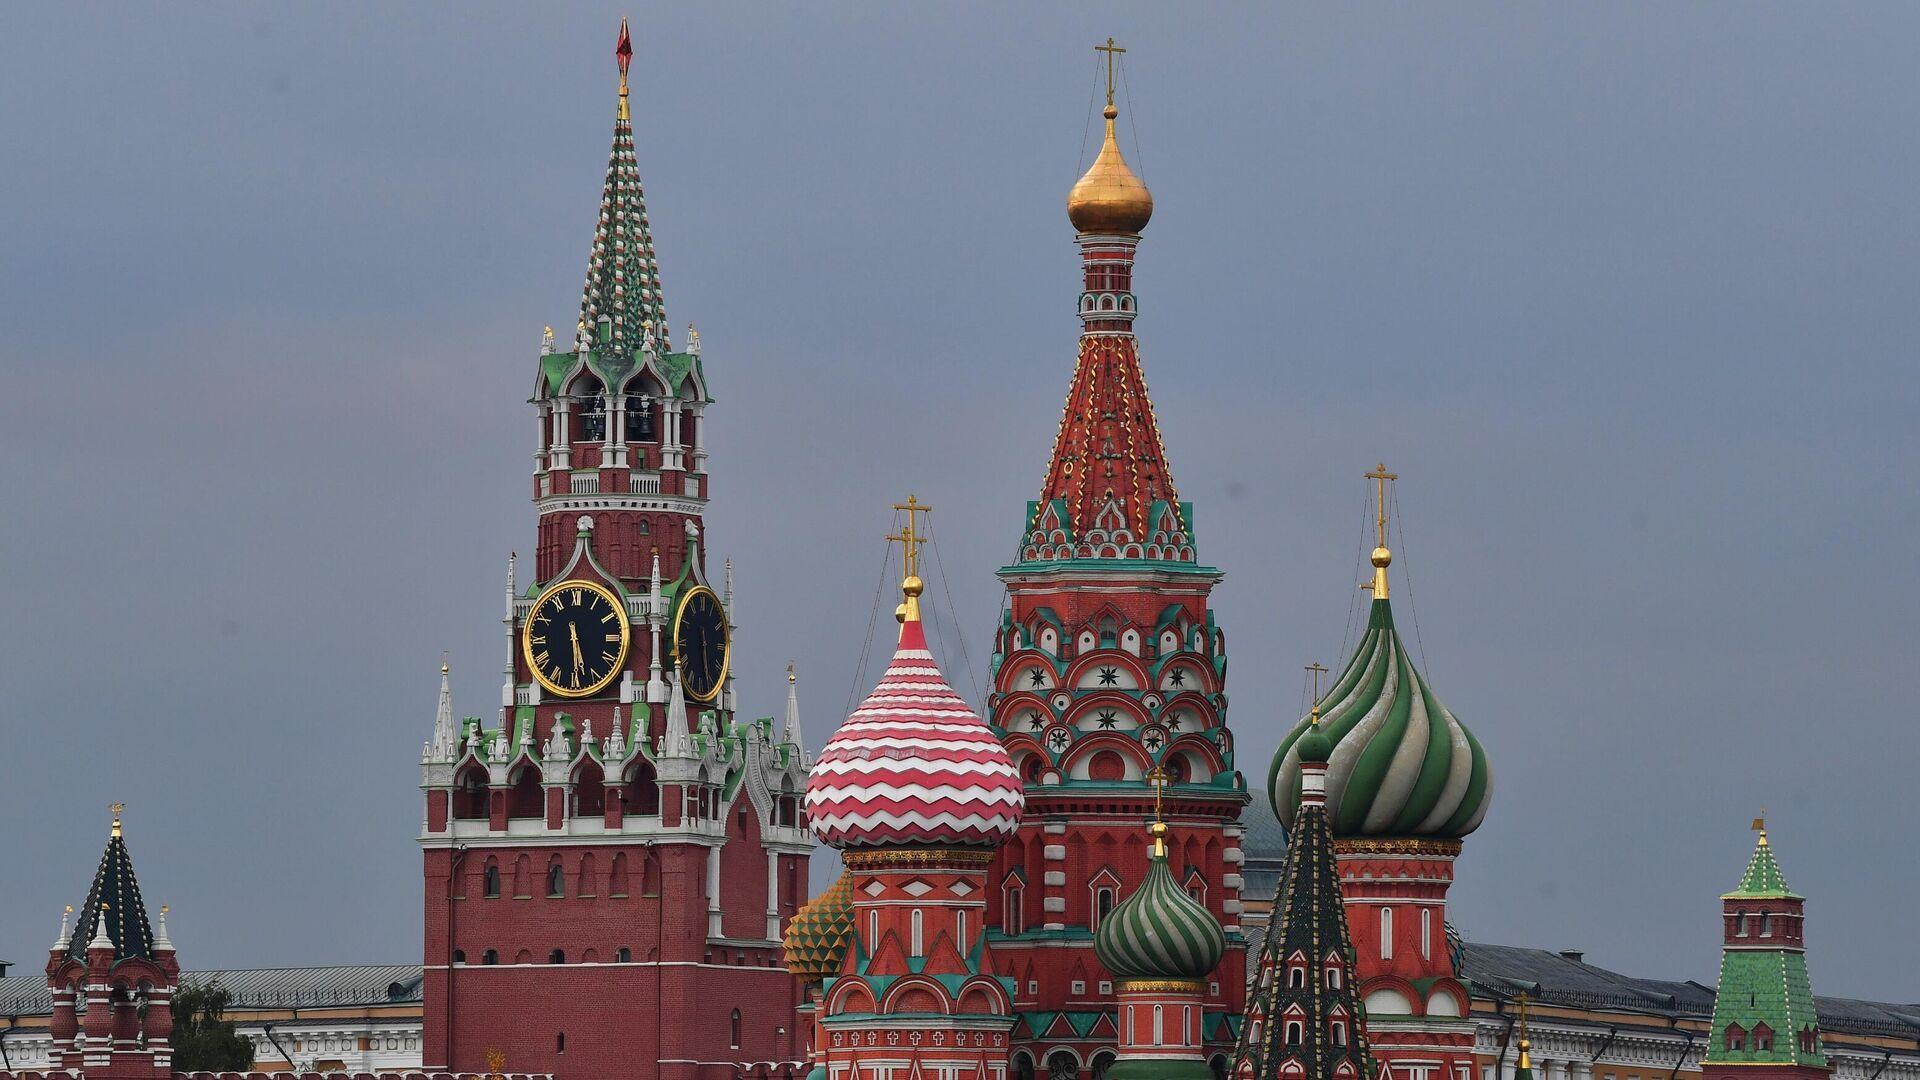 EL Kremlin de Moscú - Sputnik Mundo, 1920, 01.10.2021